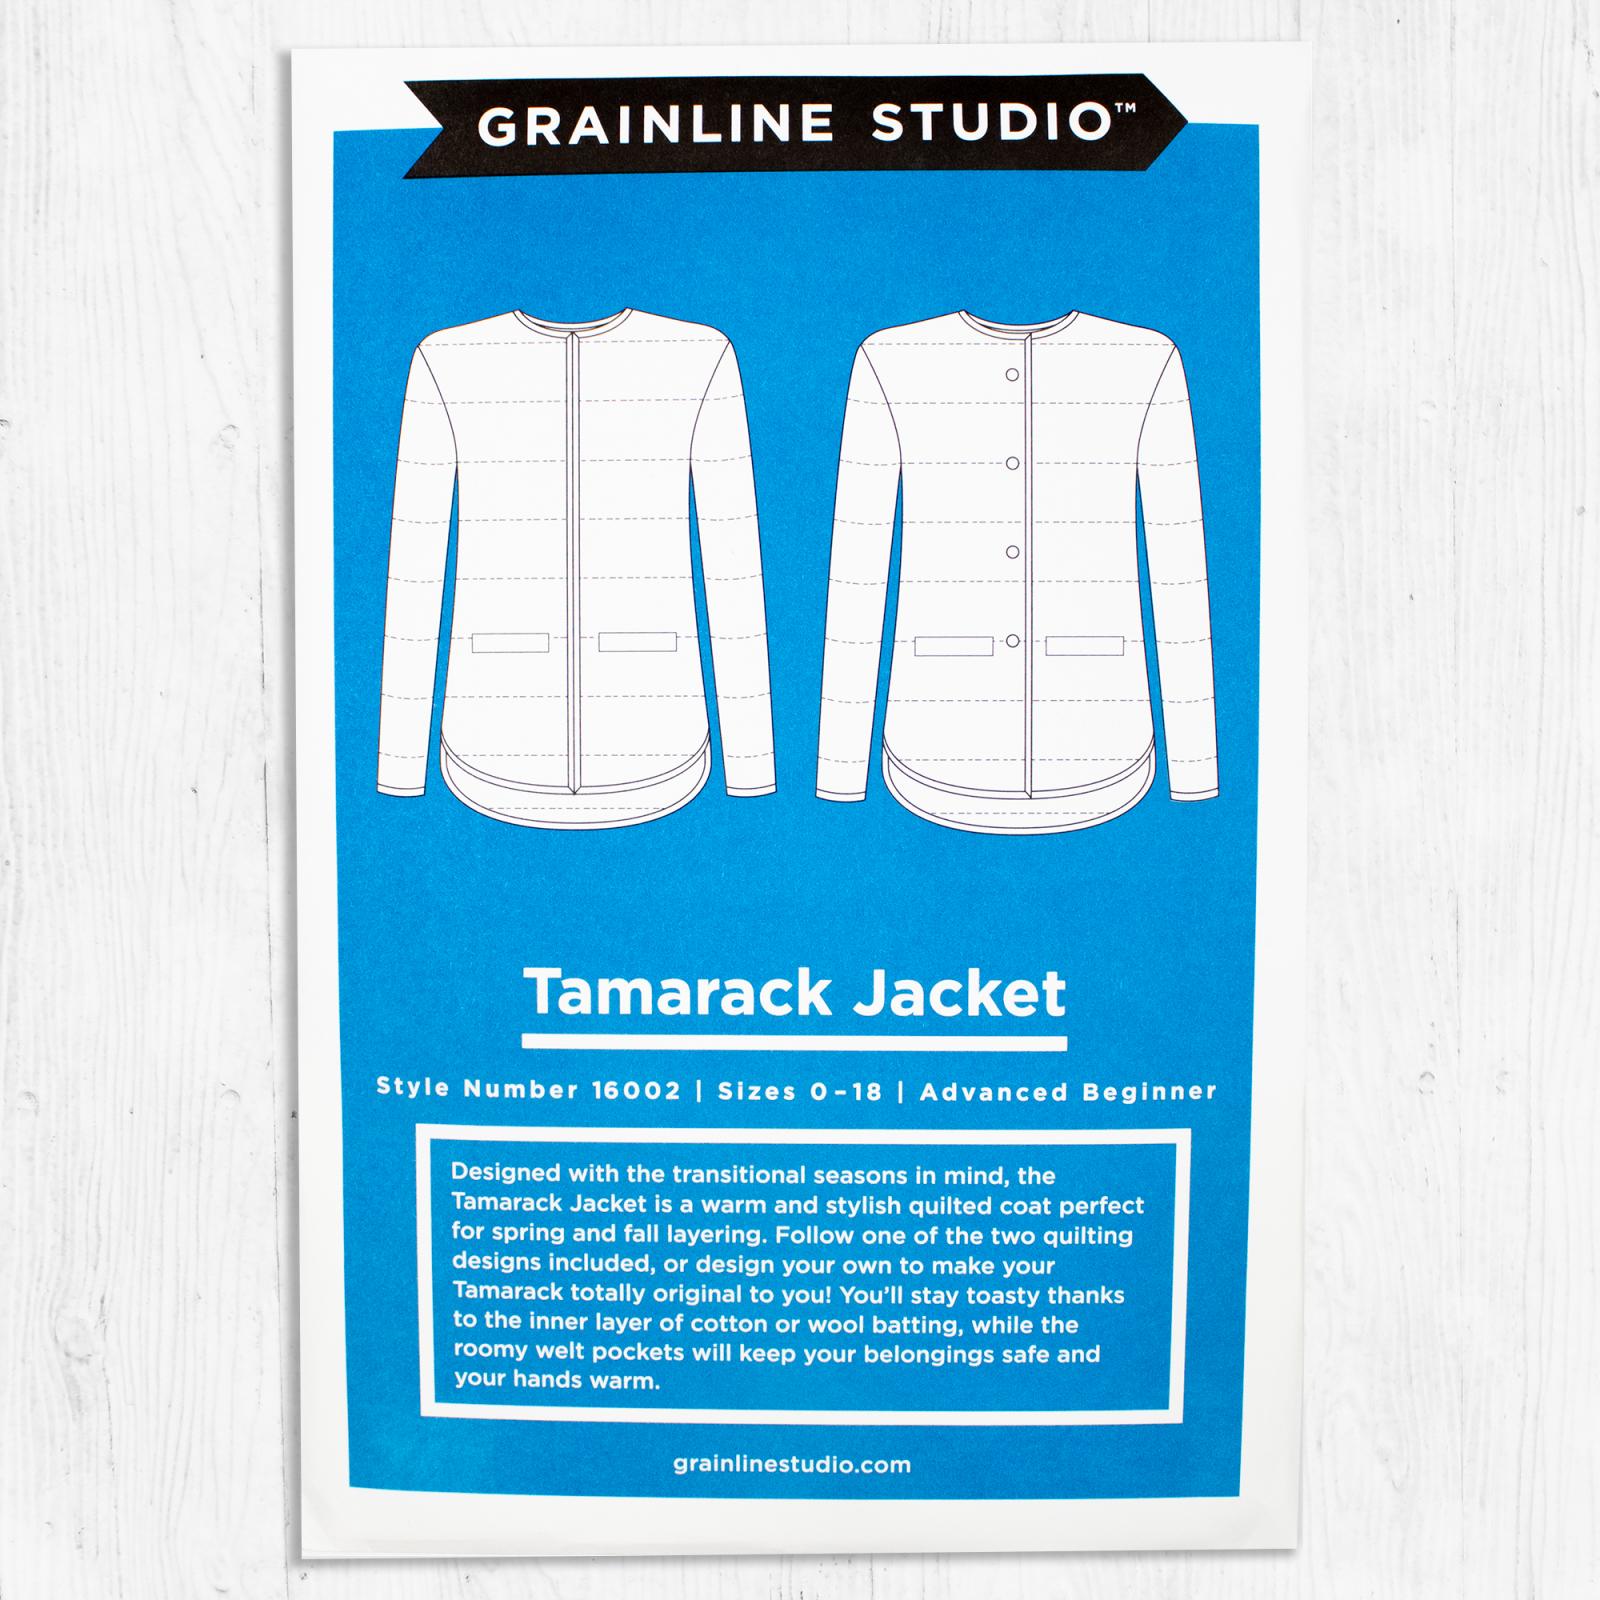 Grainline Studios - Tamarack Jacket